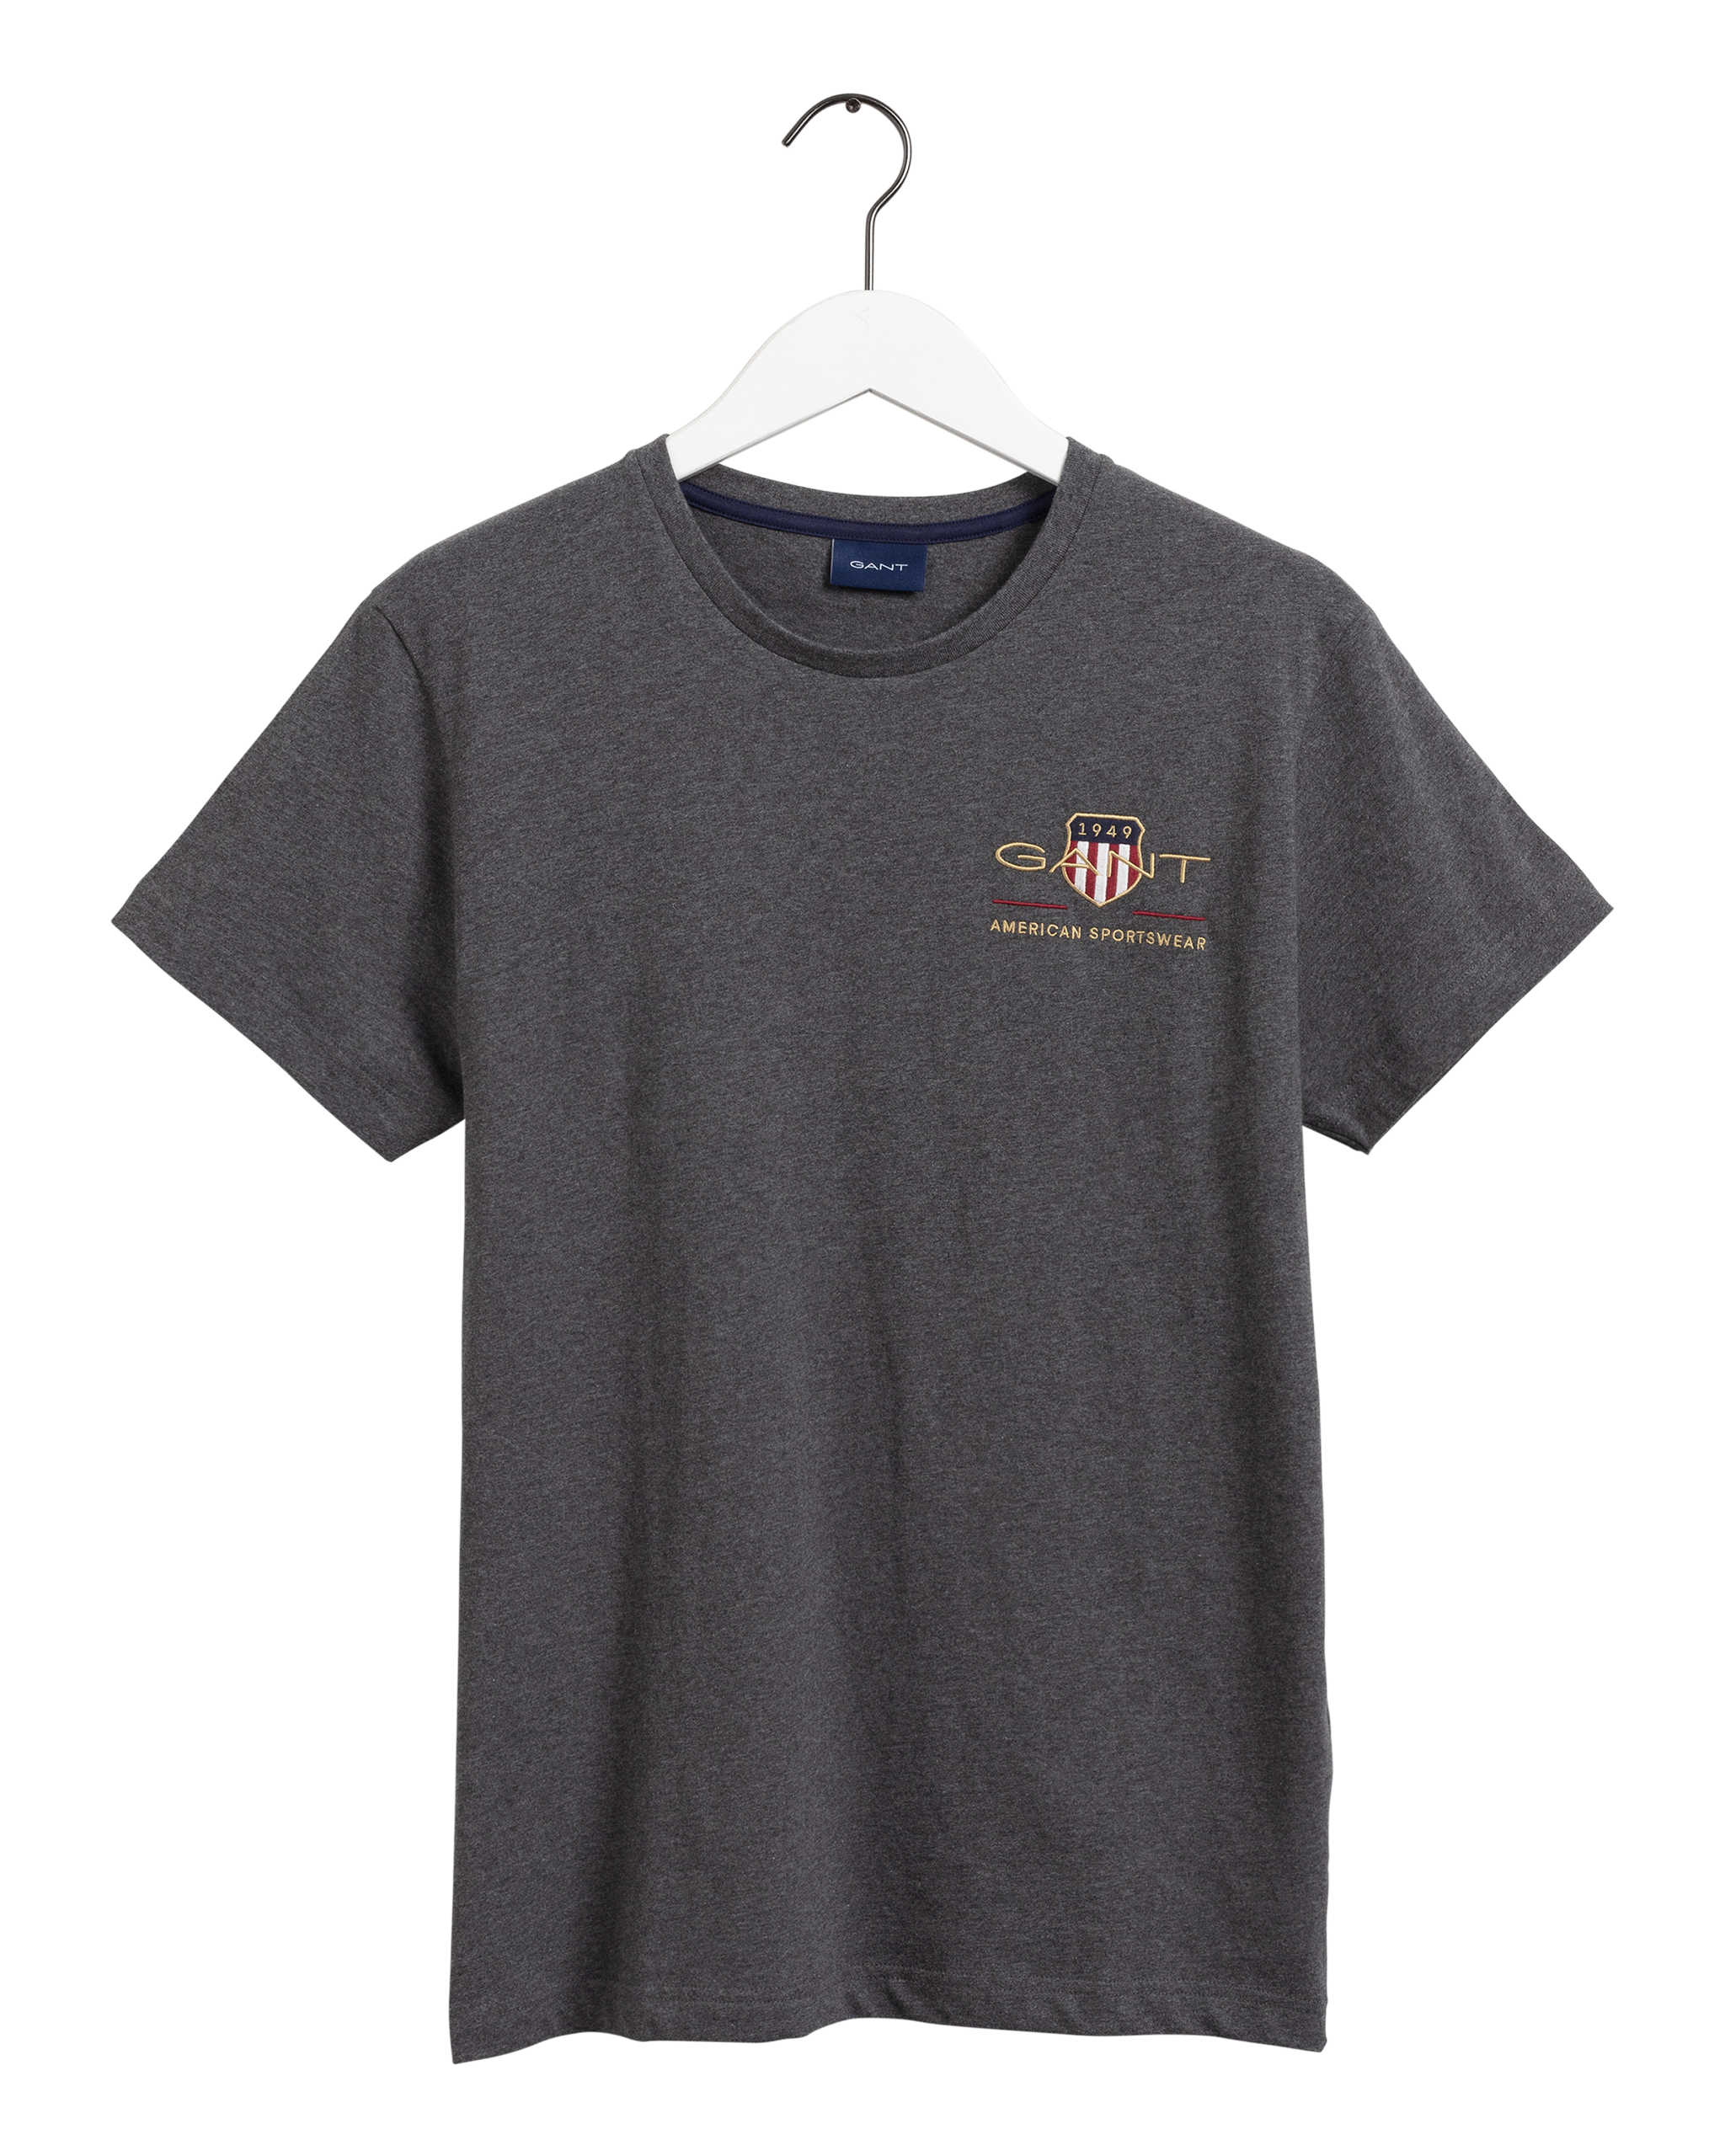 Gant Archive Shield Broderi T-shirt, Antracit Melange, XXL